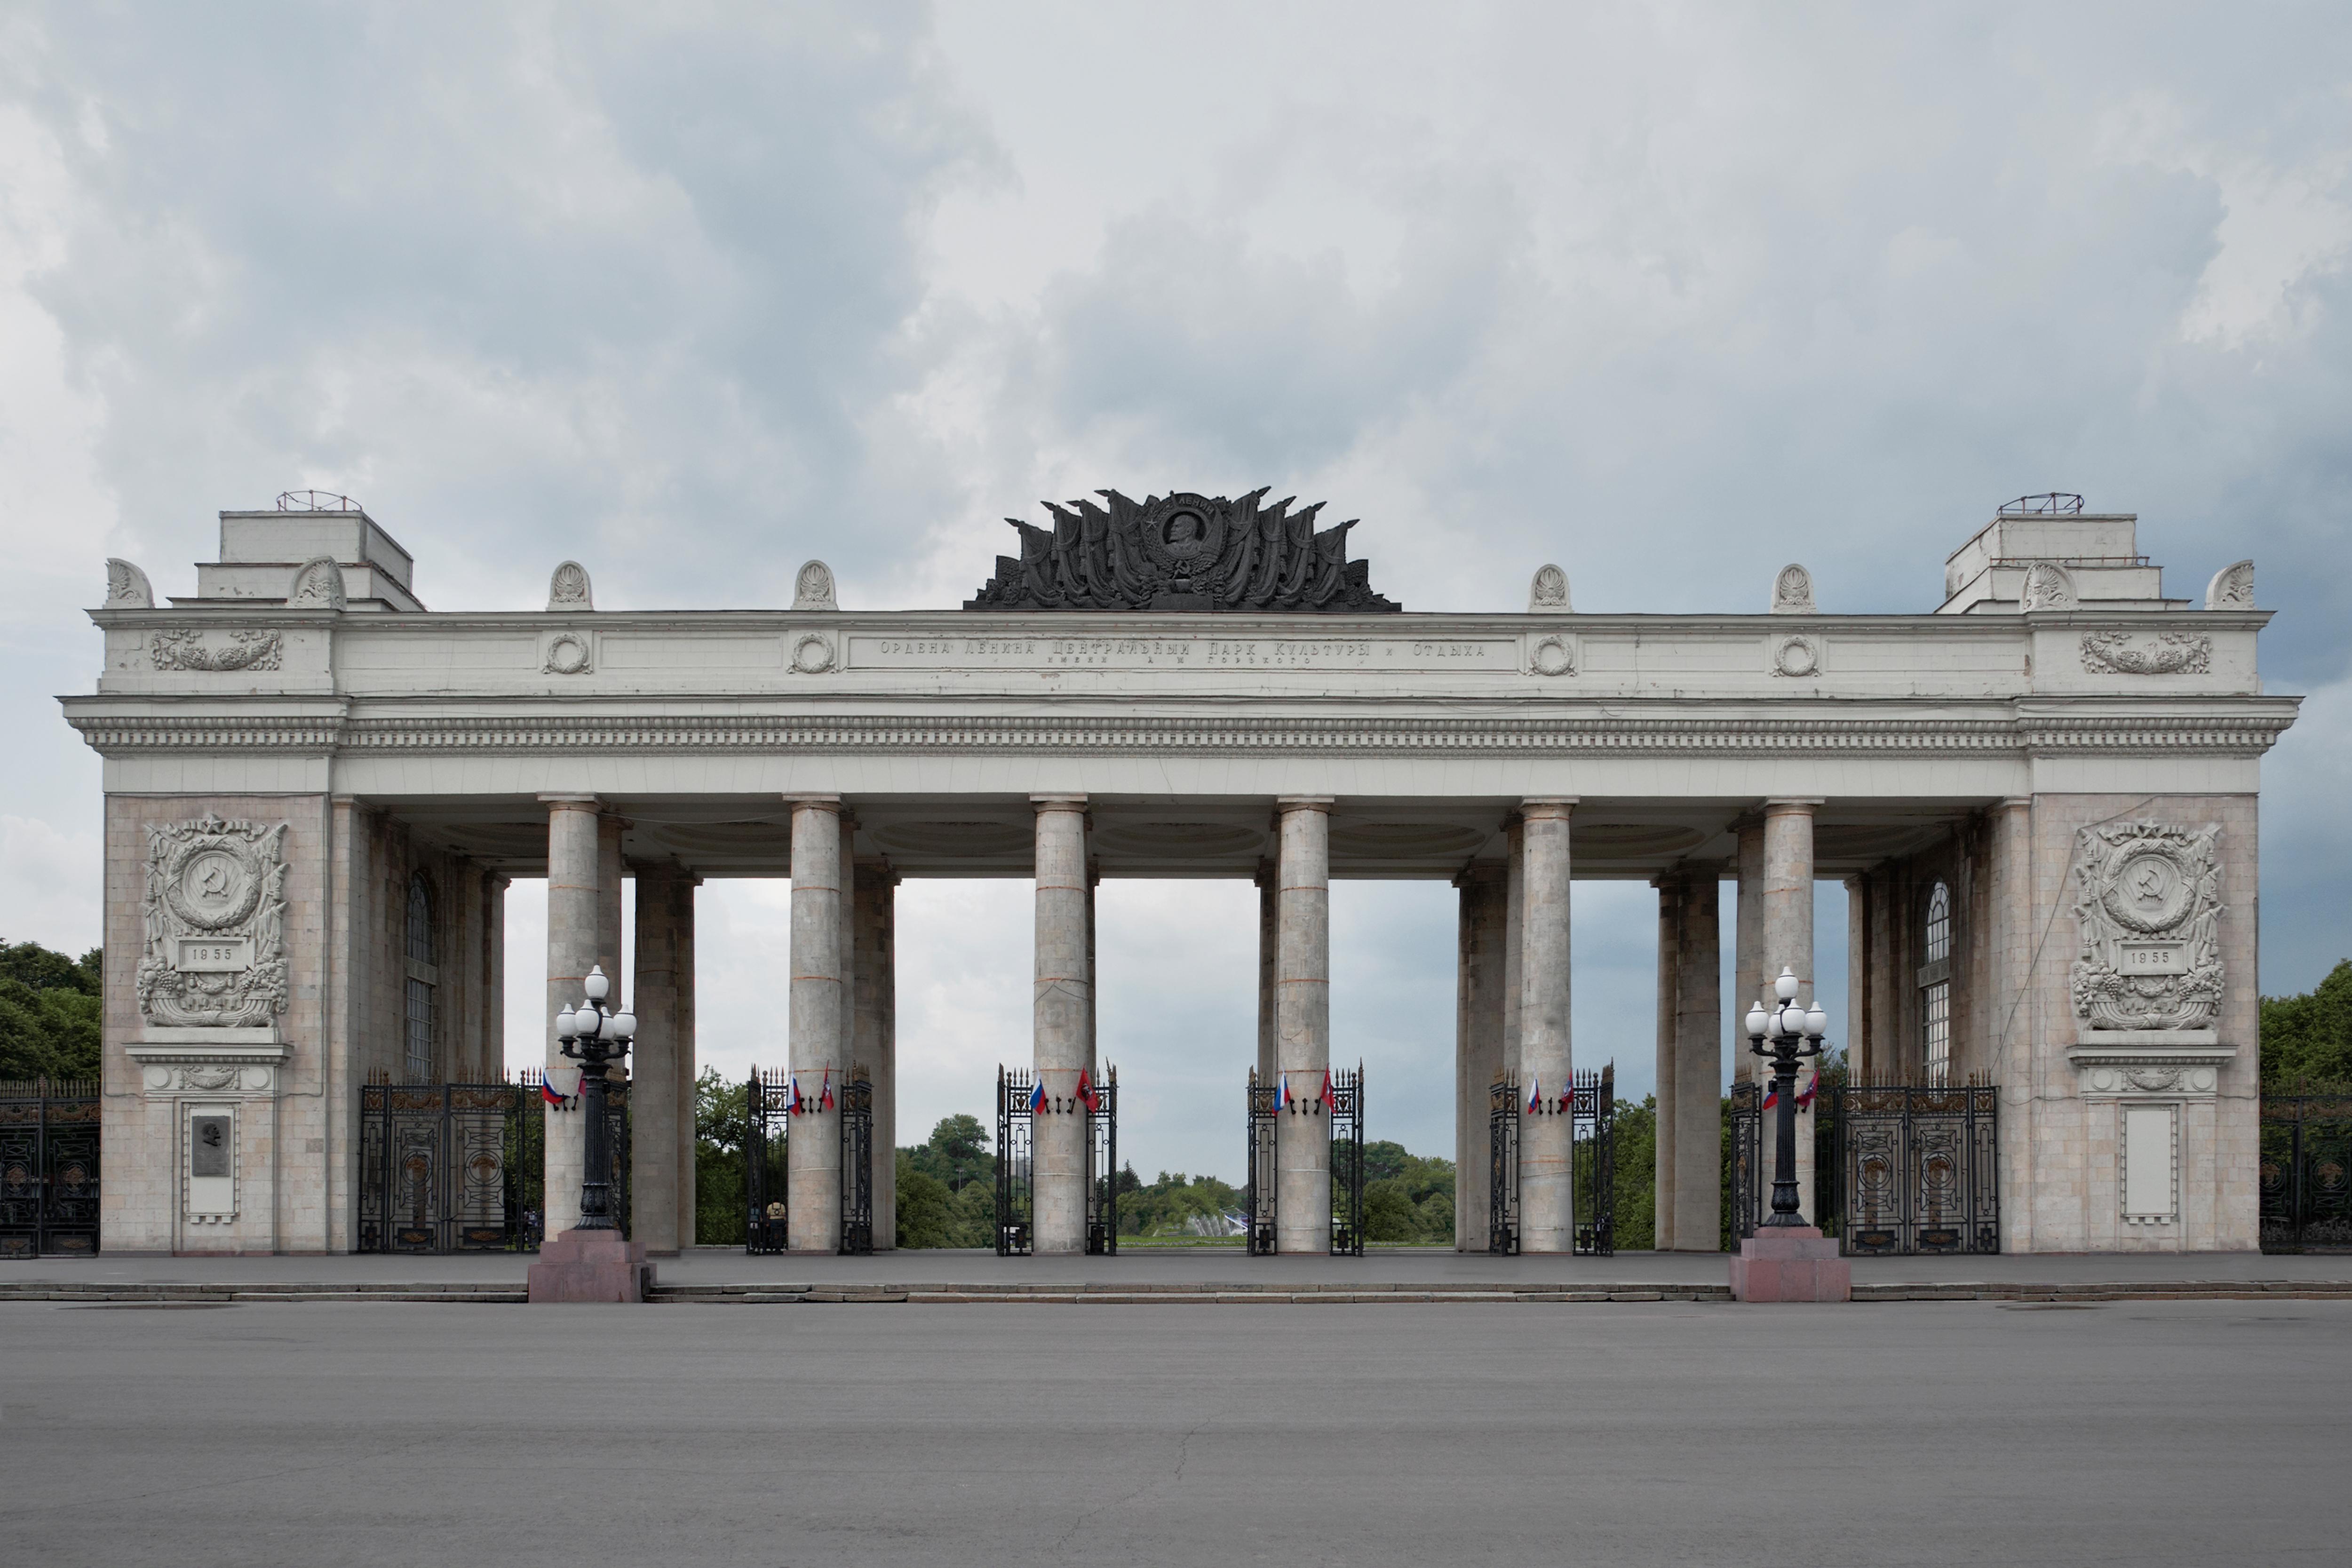 Main entrance gorky park moscow 2012 by leslie hossack